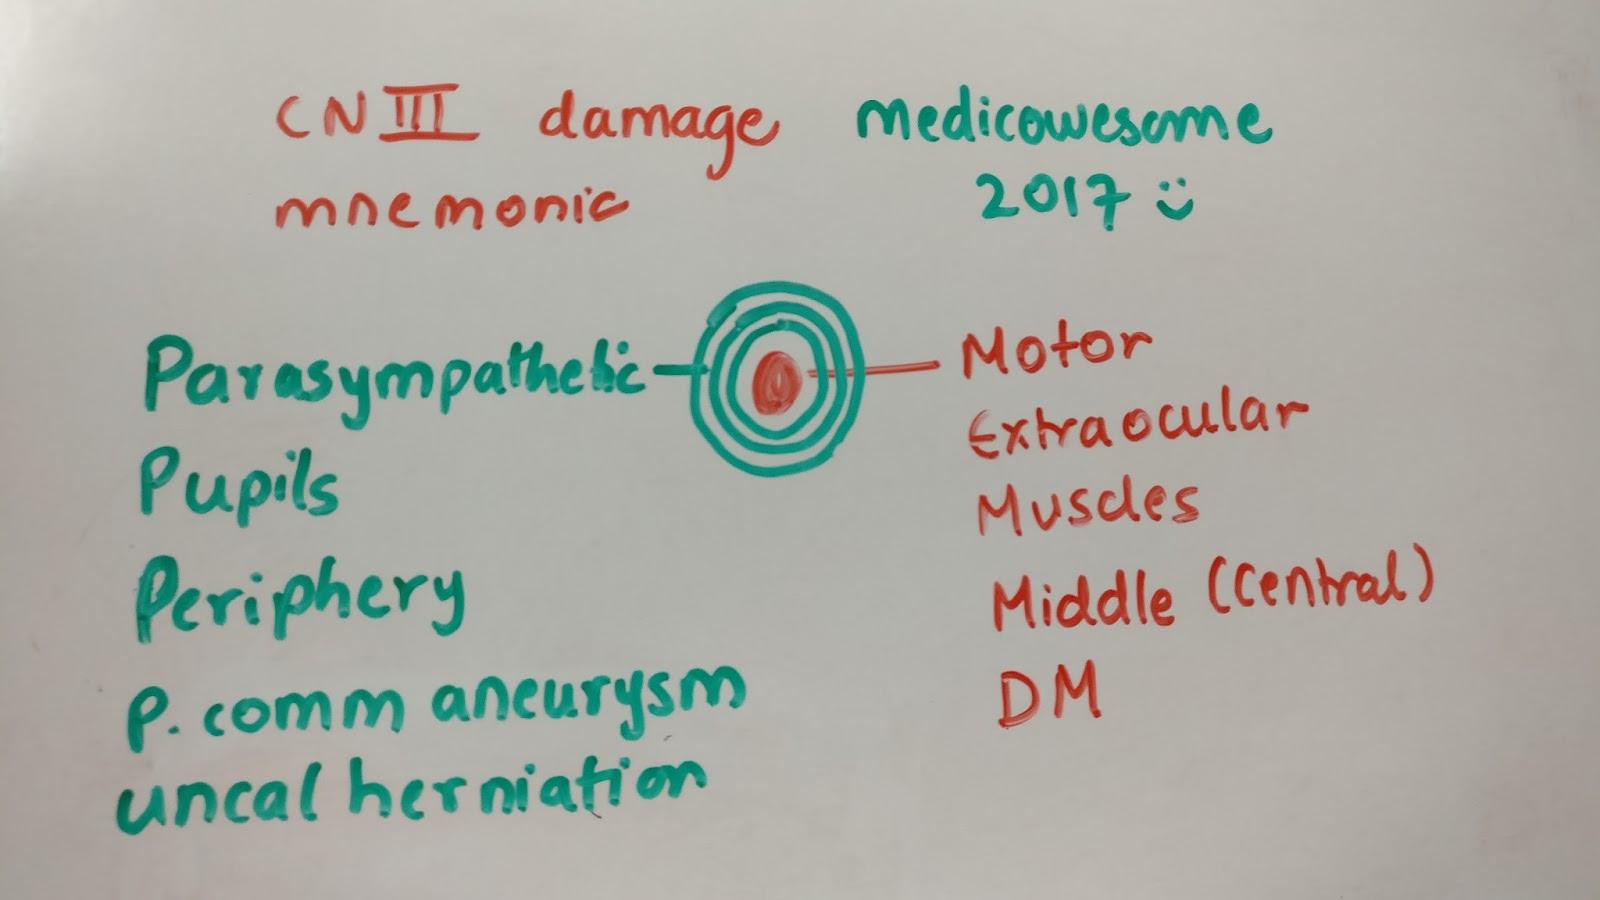 Medicowesome: Cranial nerve III damage (Oculomotor nerve damage ...